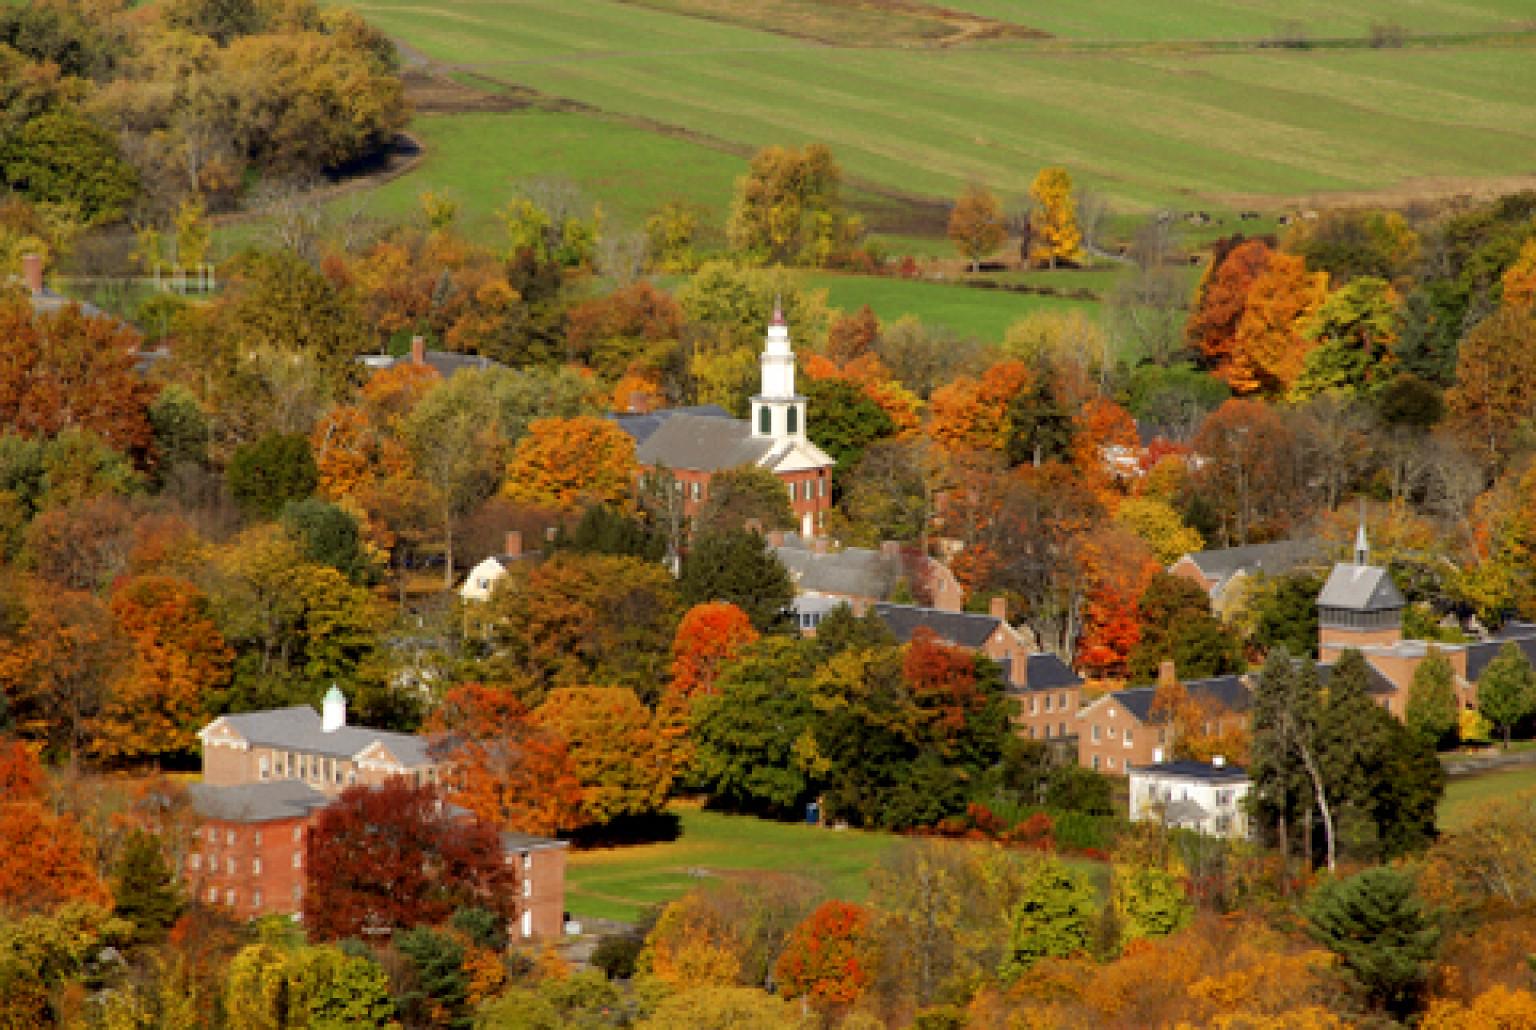 An overhead shot of Historic Deerfield.